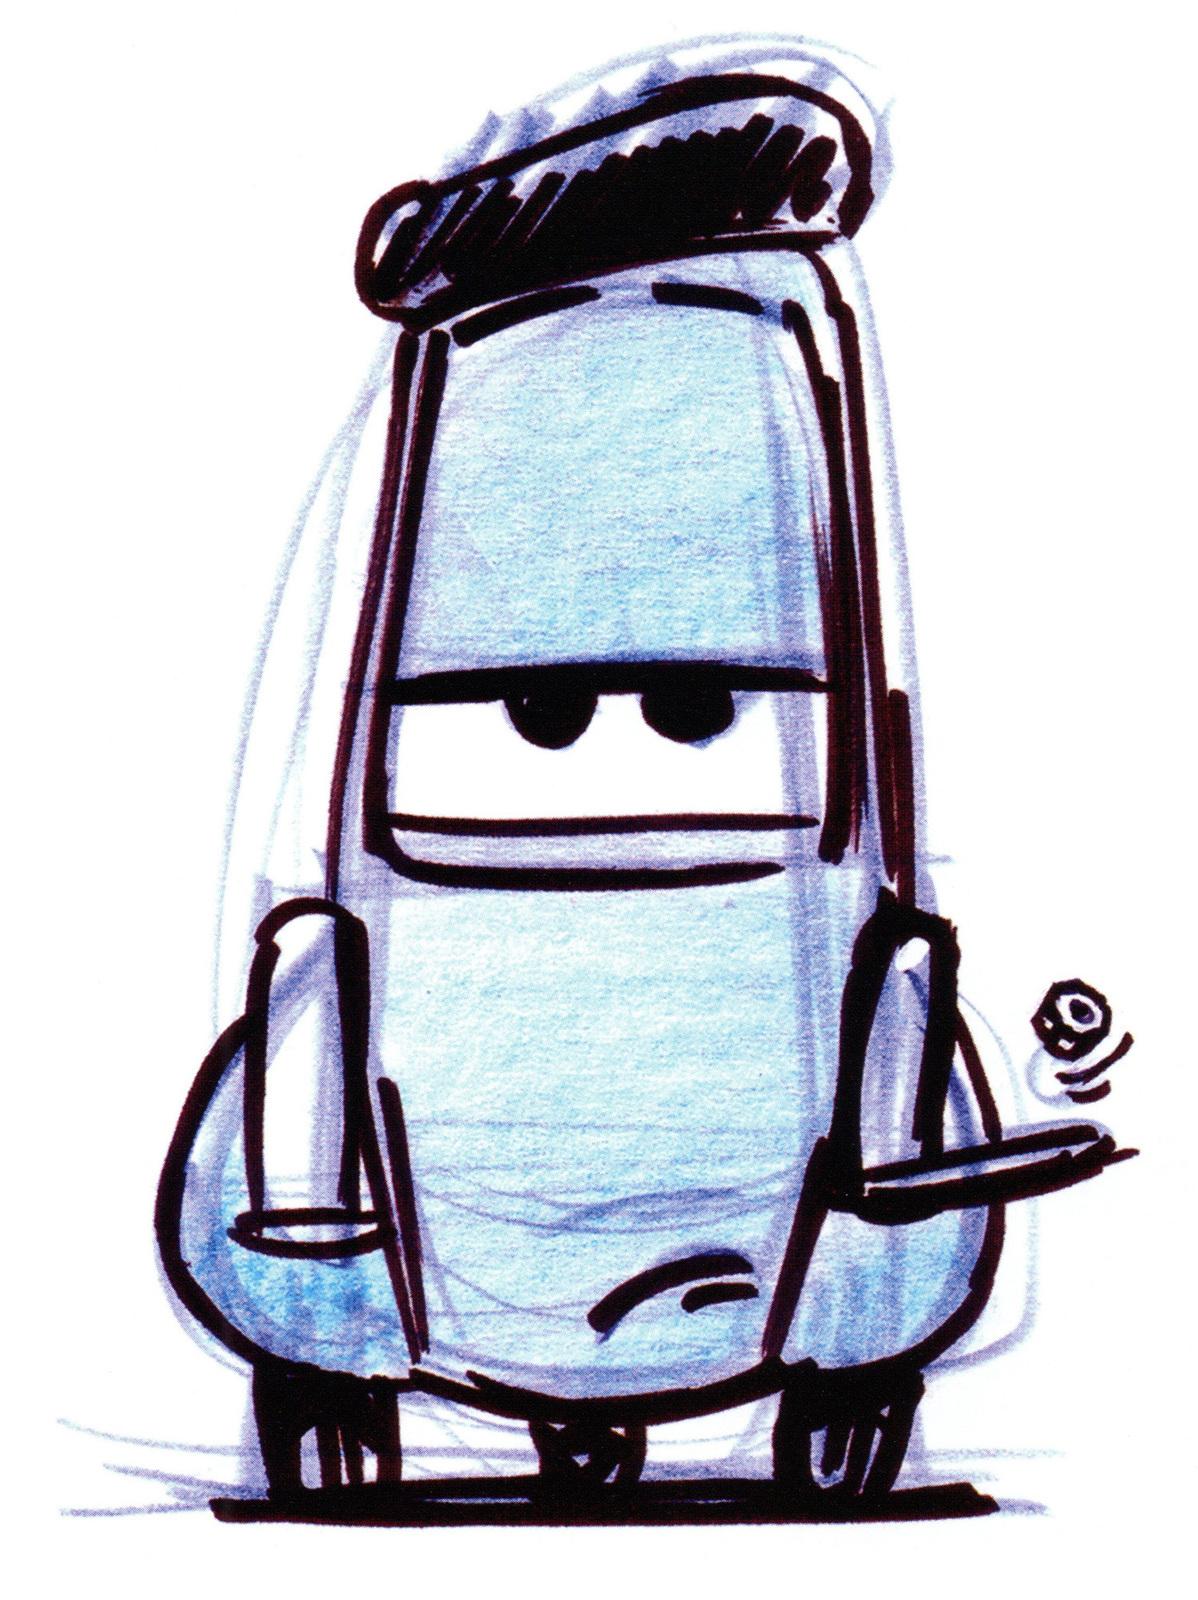 1198x1600 Pin By Mari Lena On Disneypixar Cars, Drawings